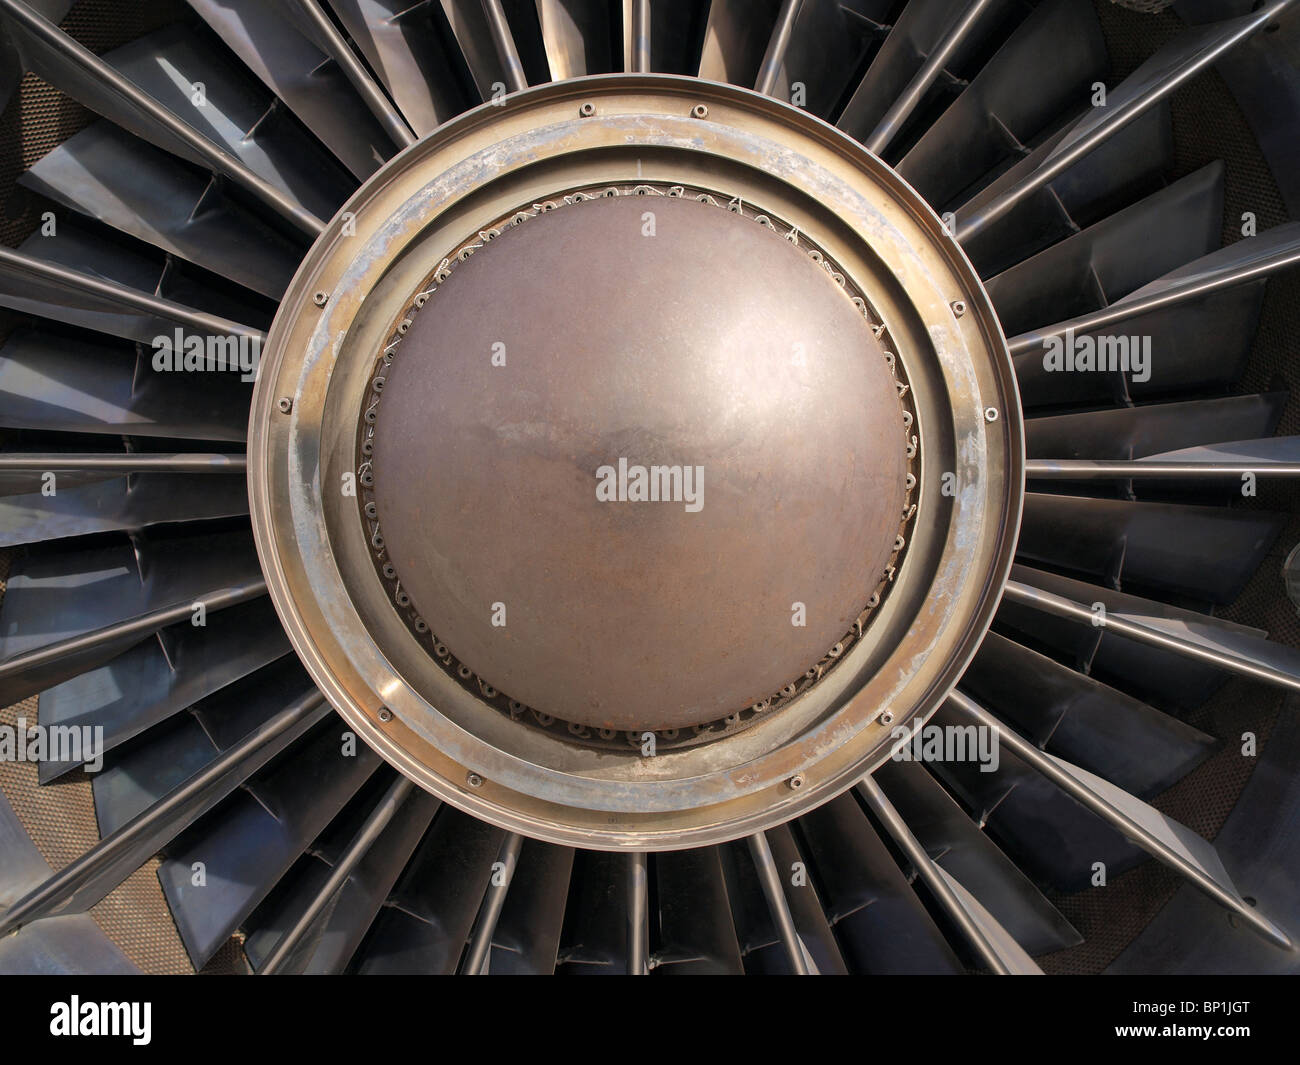 Vintage Jet-Engine Turbine. Detail des Rotors und klingen. Stockbild